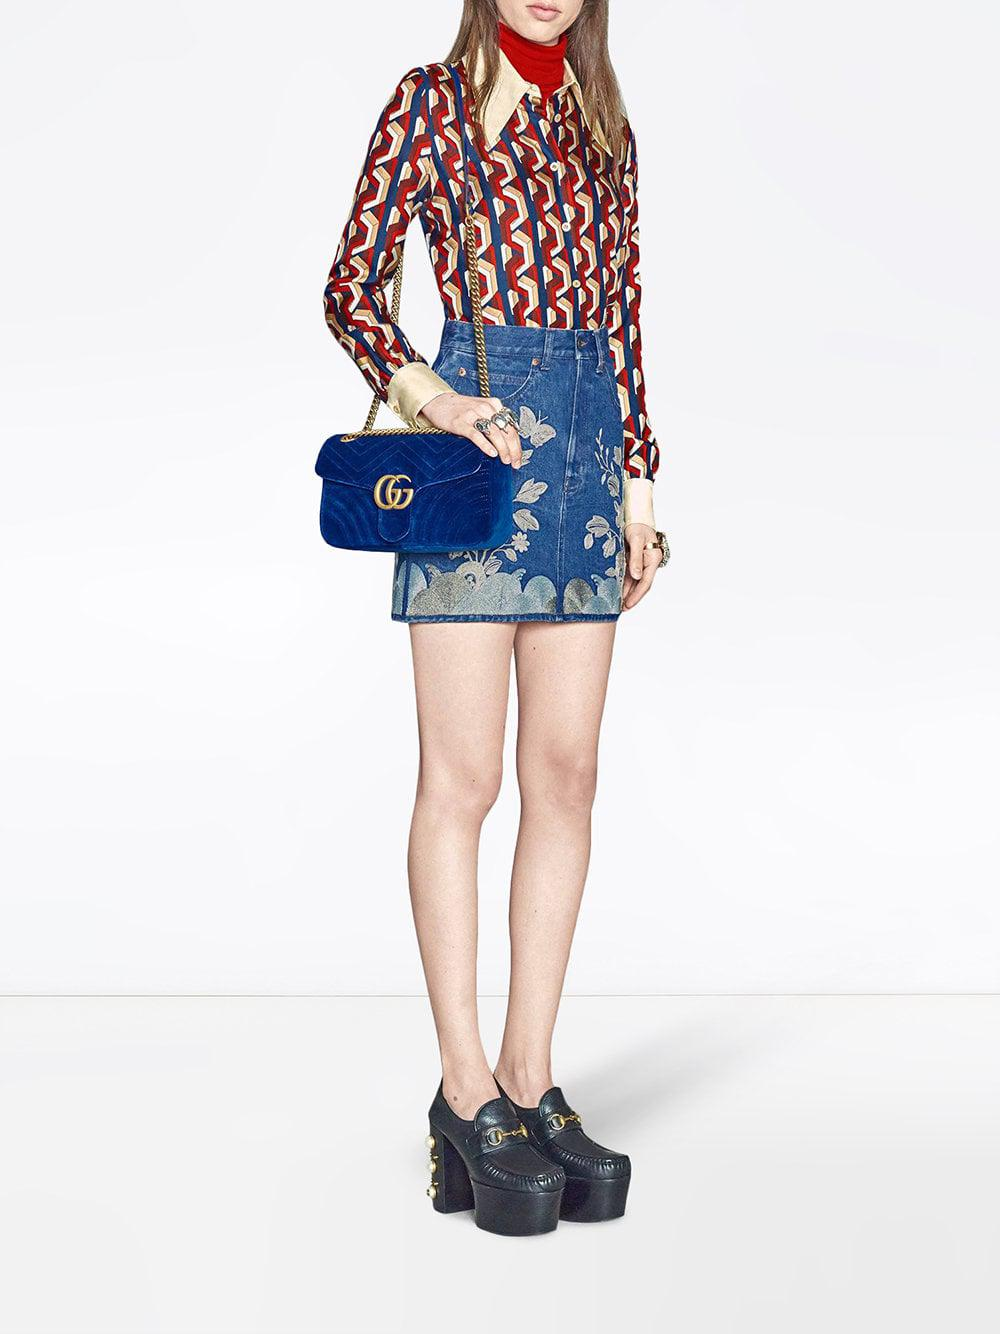 779b299046c Lyst - Gucci Women s GG Marmont Velvet Shoulder Bag - Hibiscus Red in Blue